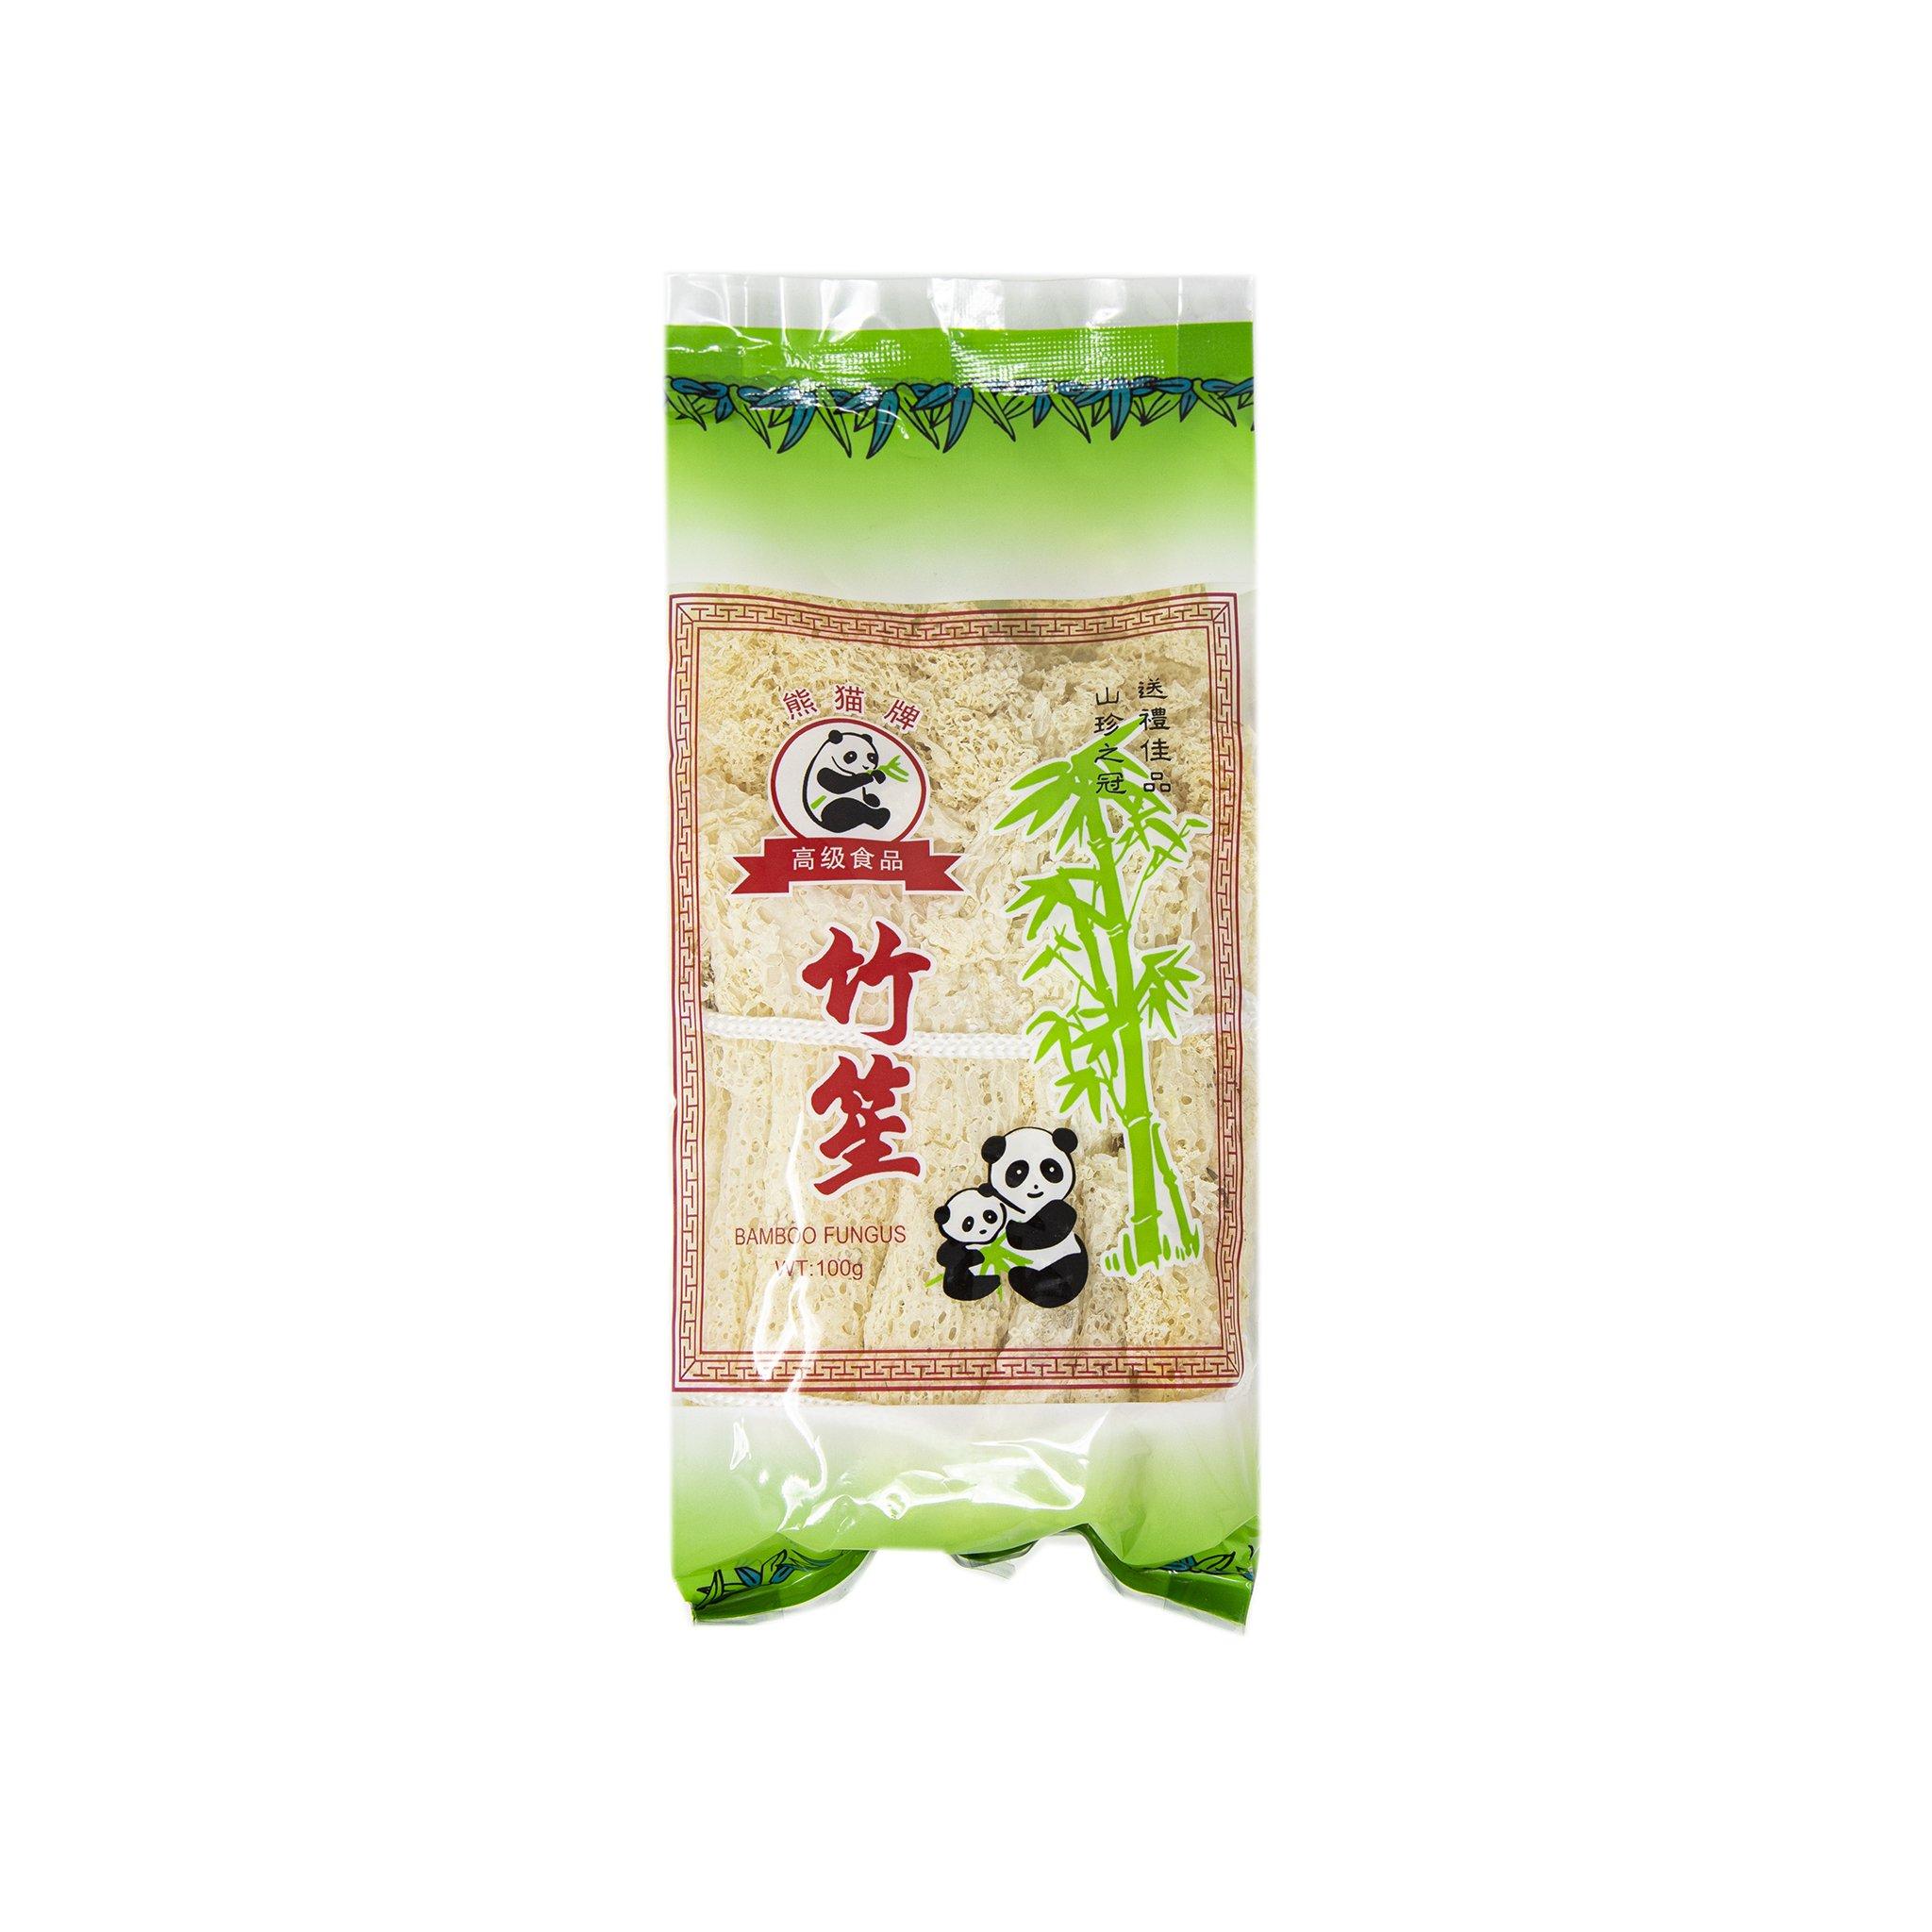 PANDA Dried Bamboo Fungus 100 G